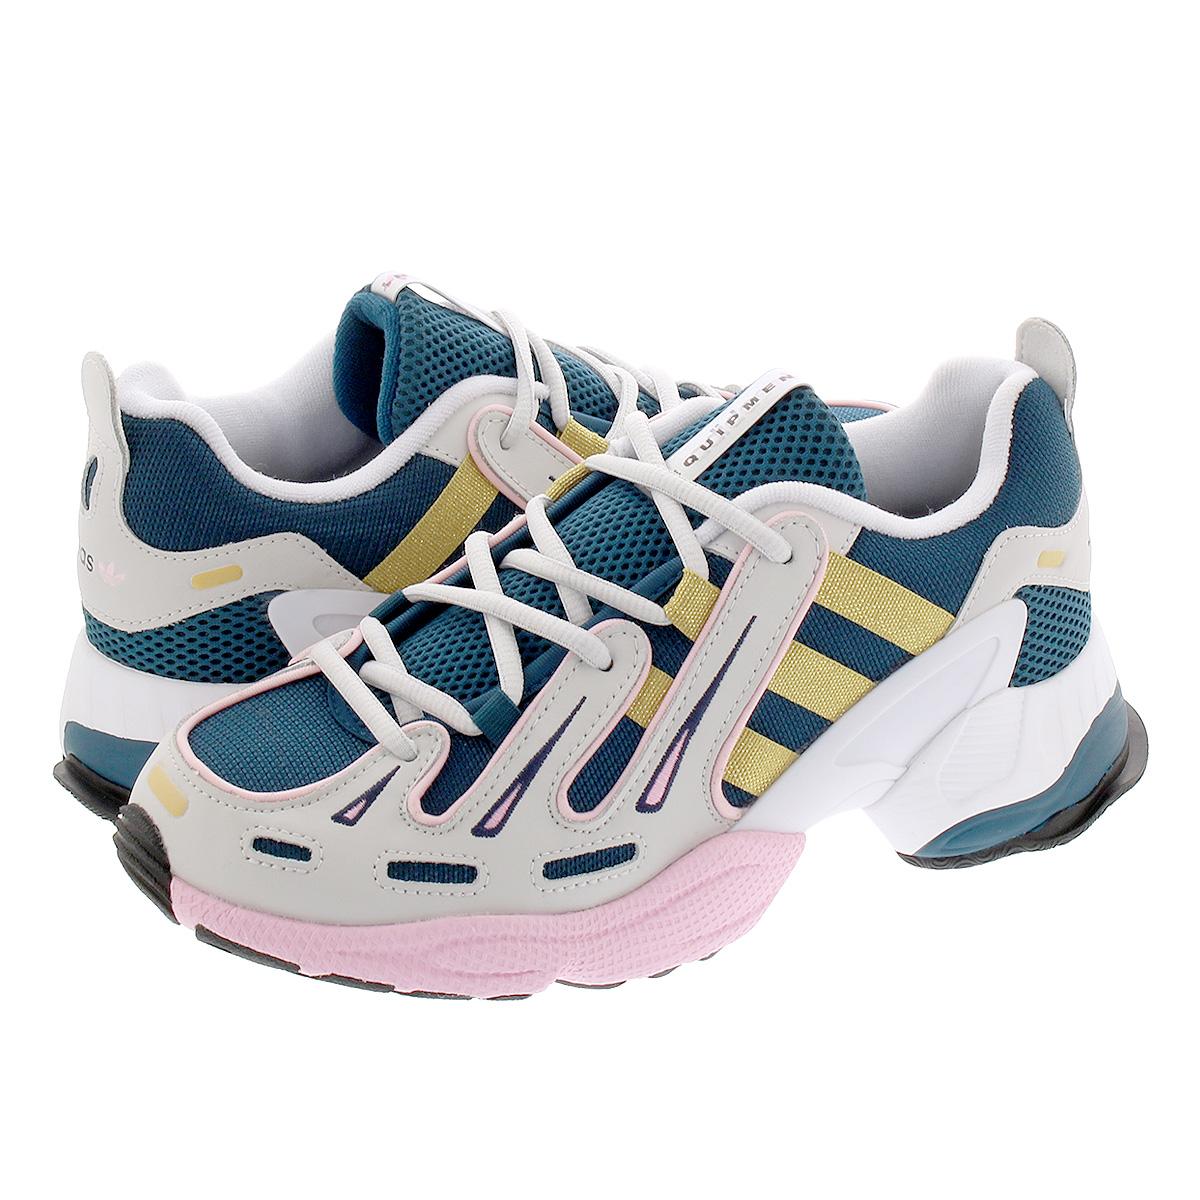 reputable site e7aba 216cb adidas EQT GAZELLE W Adidas EQT gazelle women TECH MINERAL/GOLD MET/TRUE  PINK ee5149